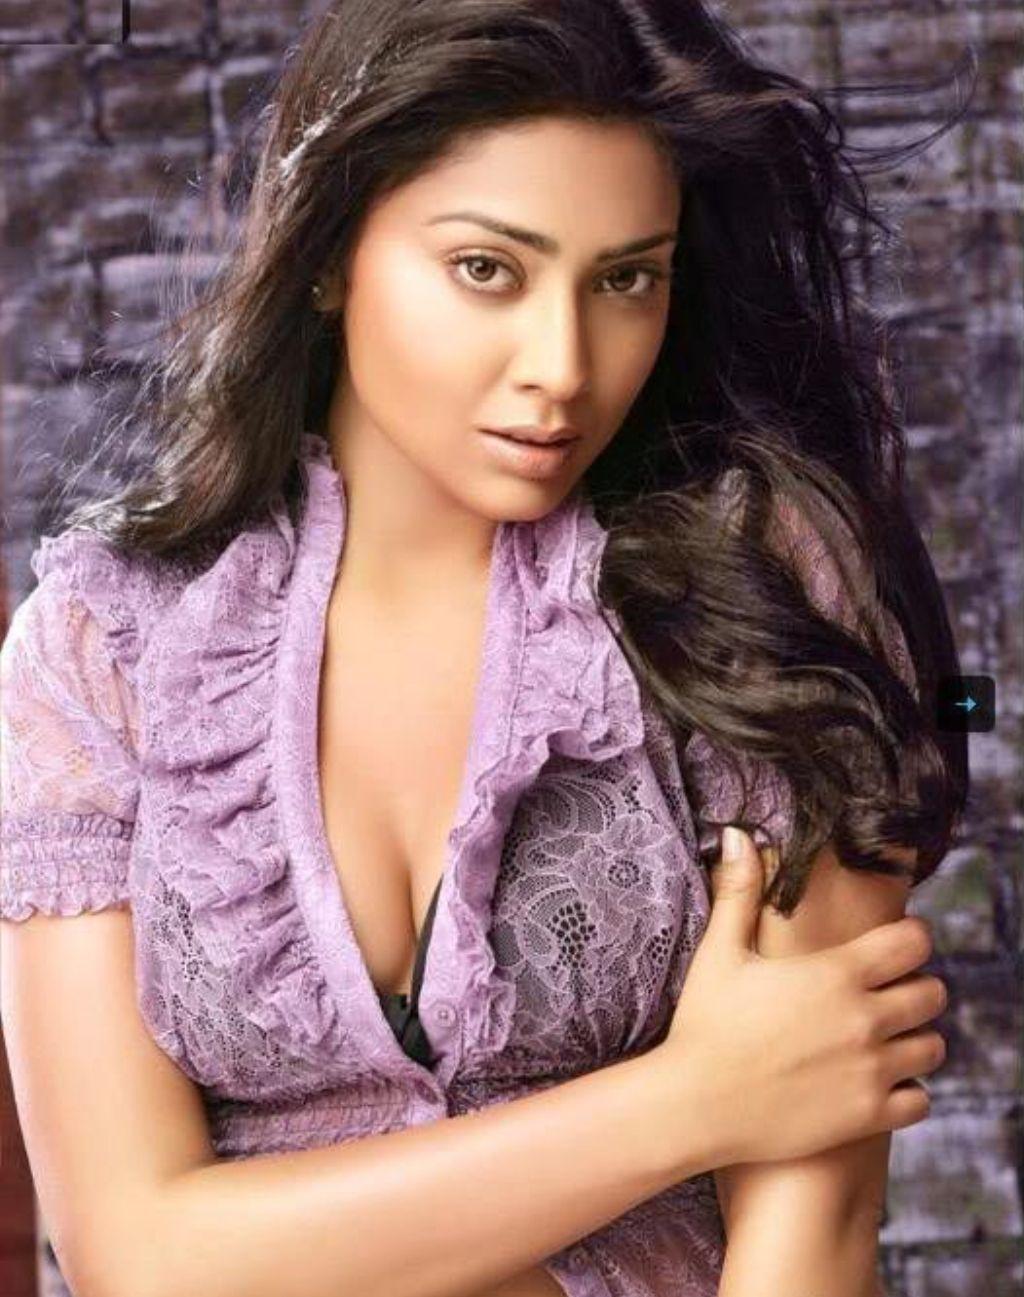 actress picture: find shriya saran hot